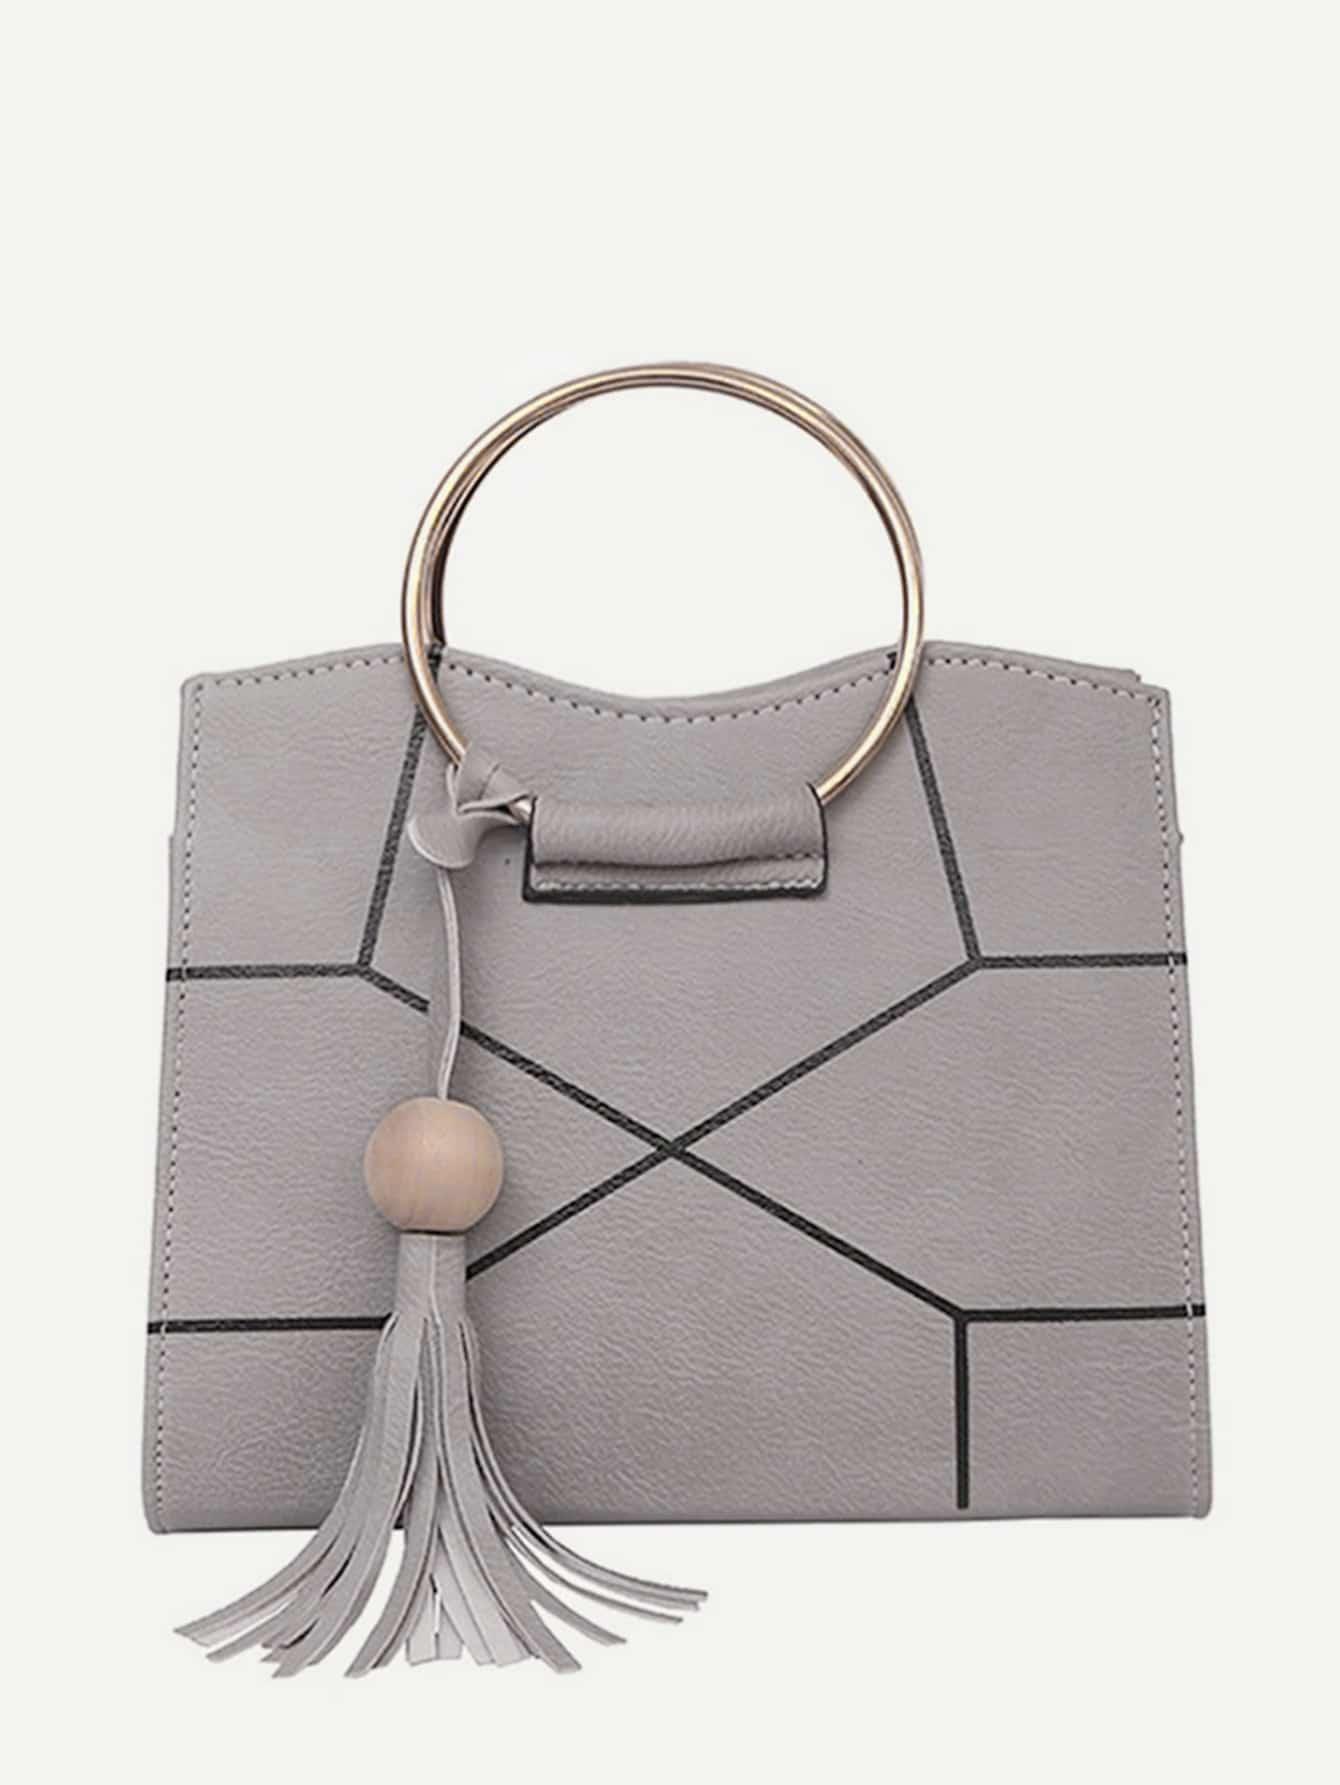 Ring Handle Geometric Design Crossbody Bag With